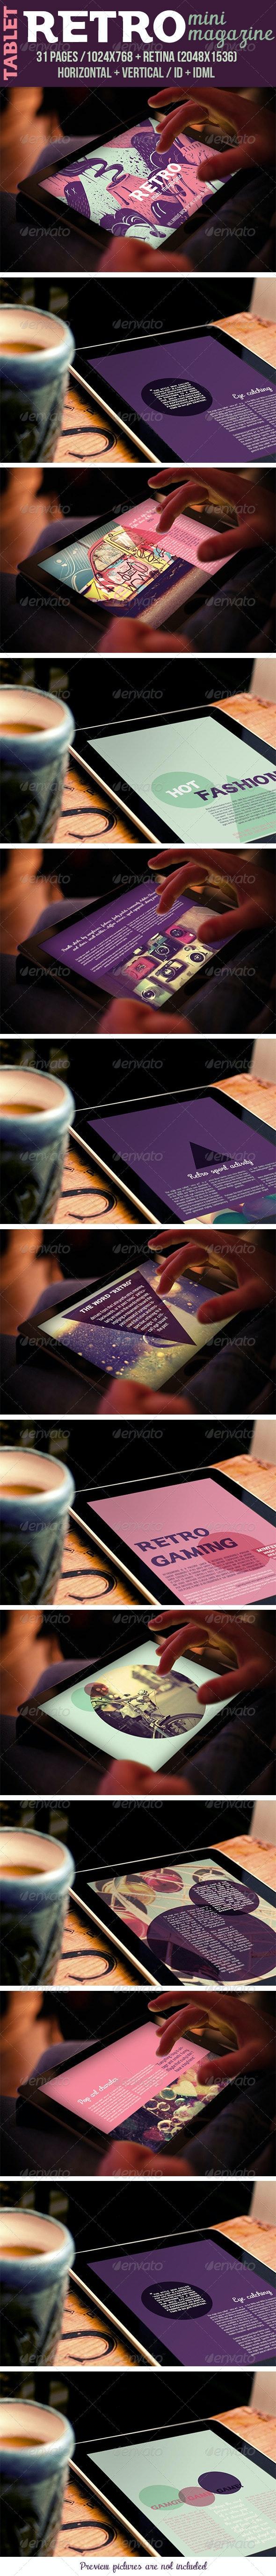 iPad & Tablet Retro Mini Magazine - Digital Magazines ePublishing